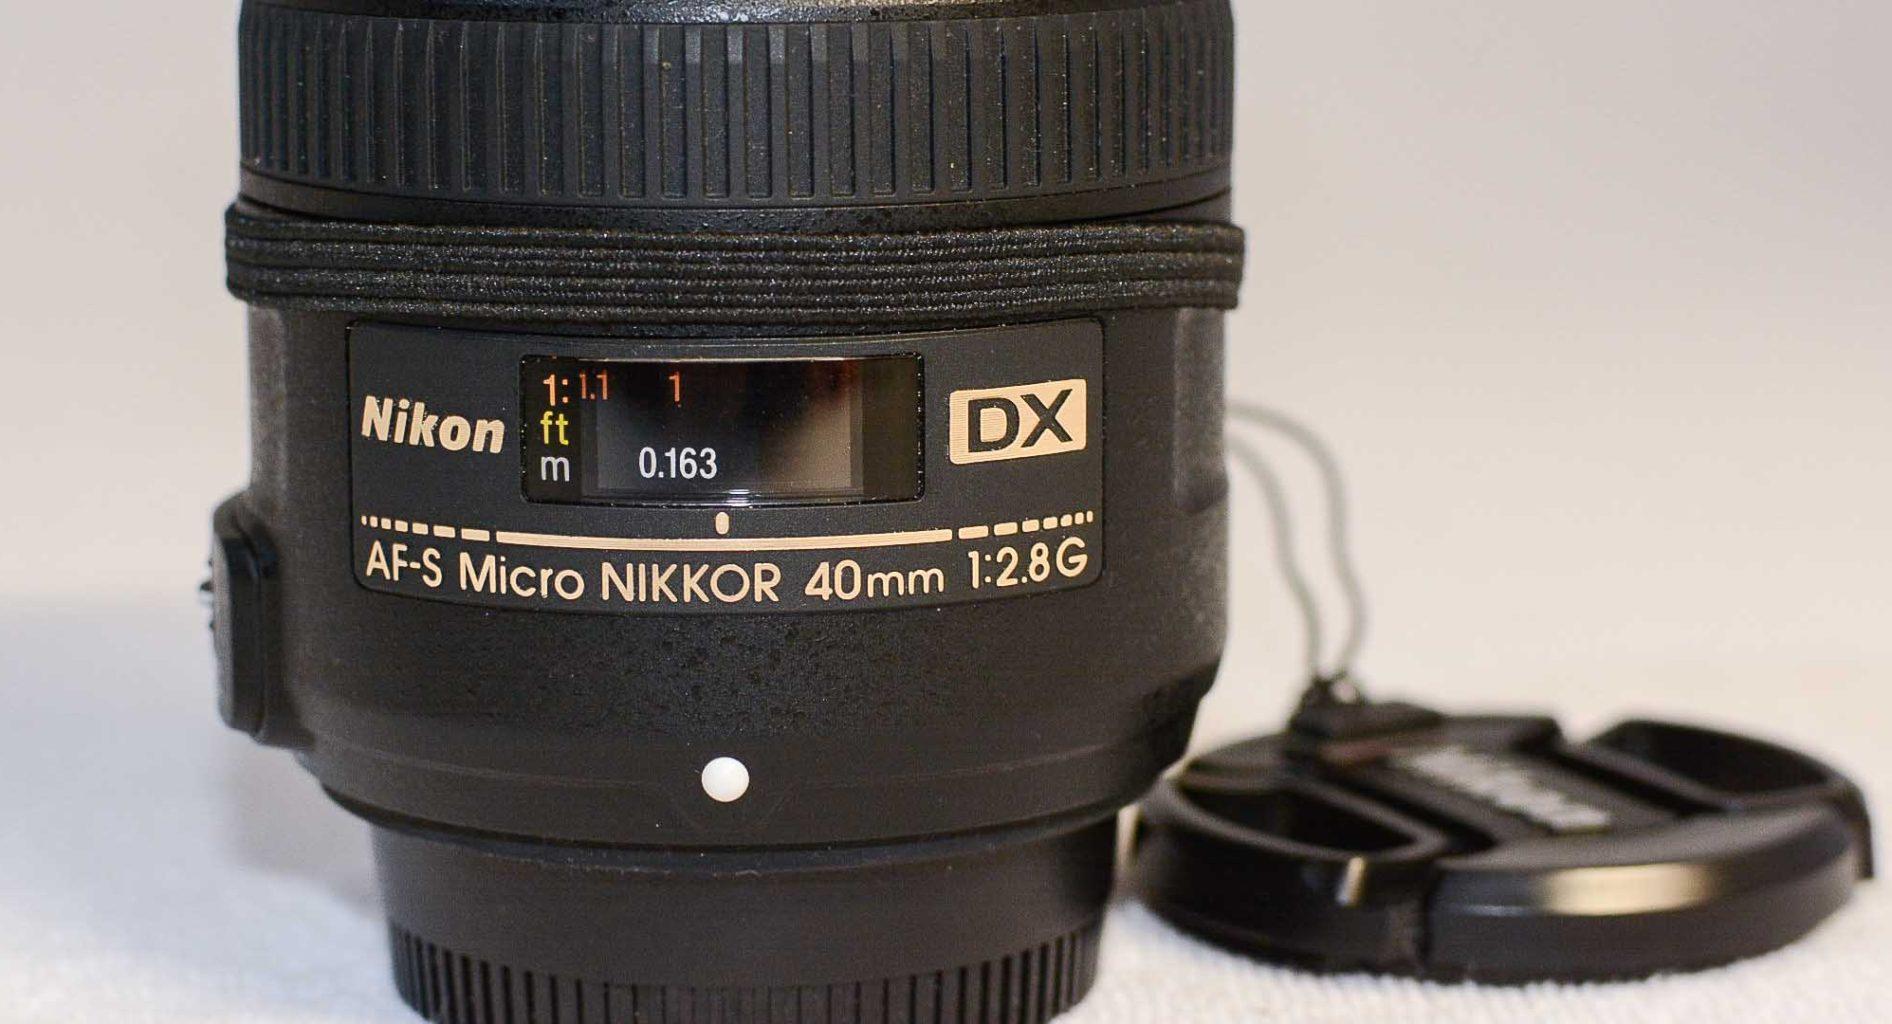 Nikon AF-S DX Micro-Nikkor 40mm 1:2,8G, meine Erfahrungen.